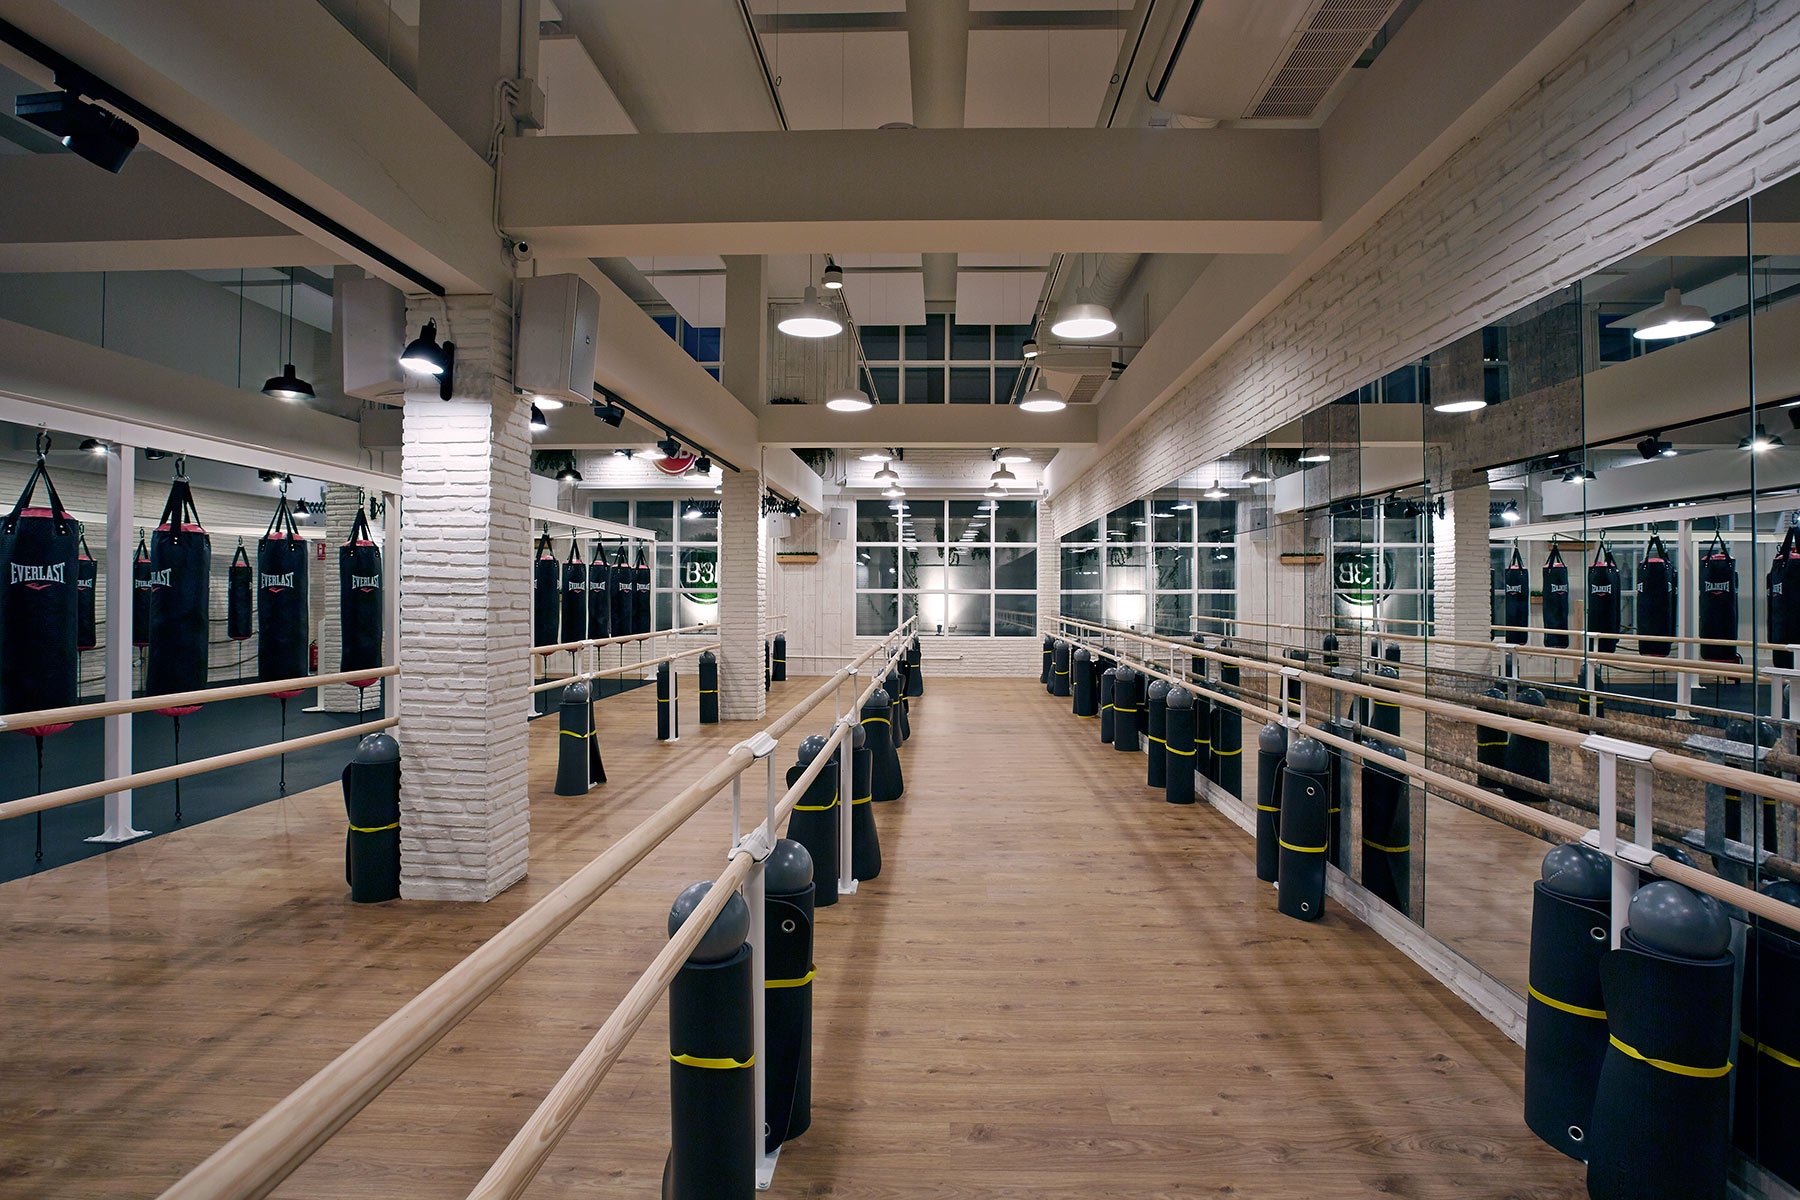 Dise o espacios singulares decoraci n gimnasio en madrid - Diseno interior madrid ...